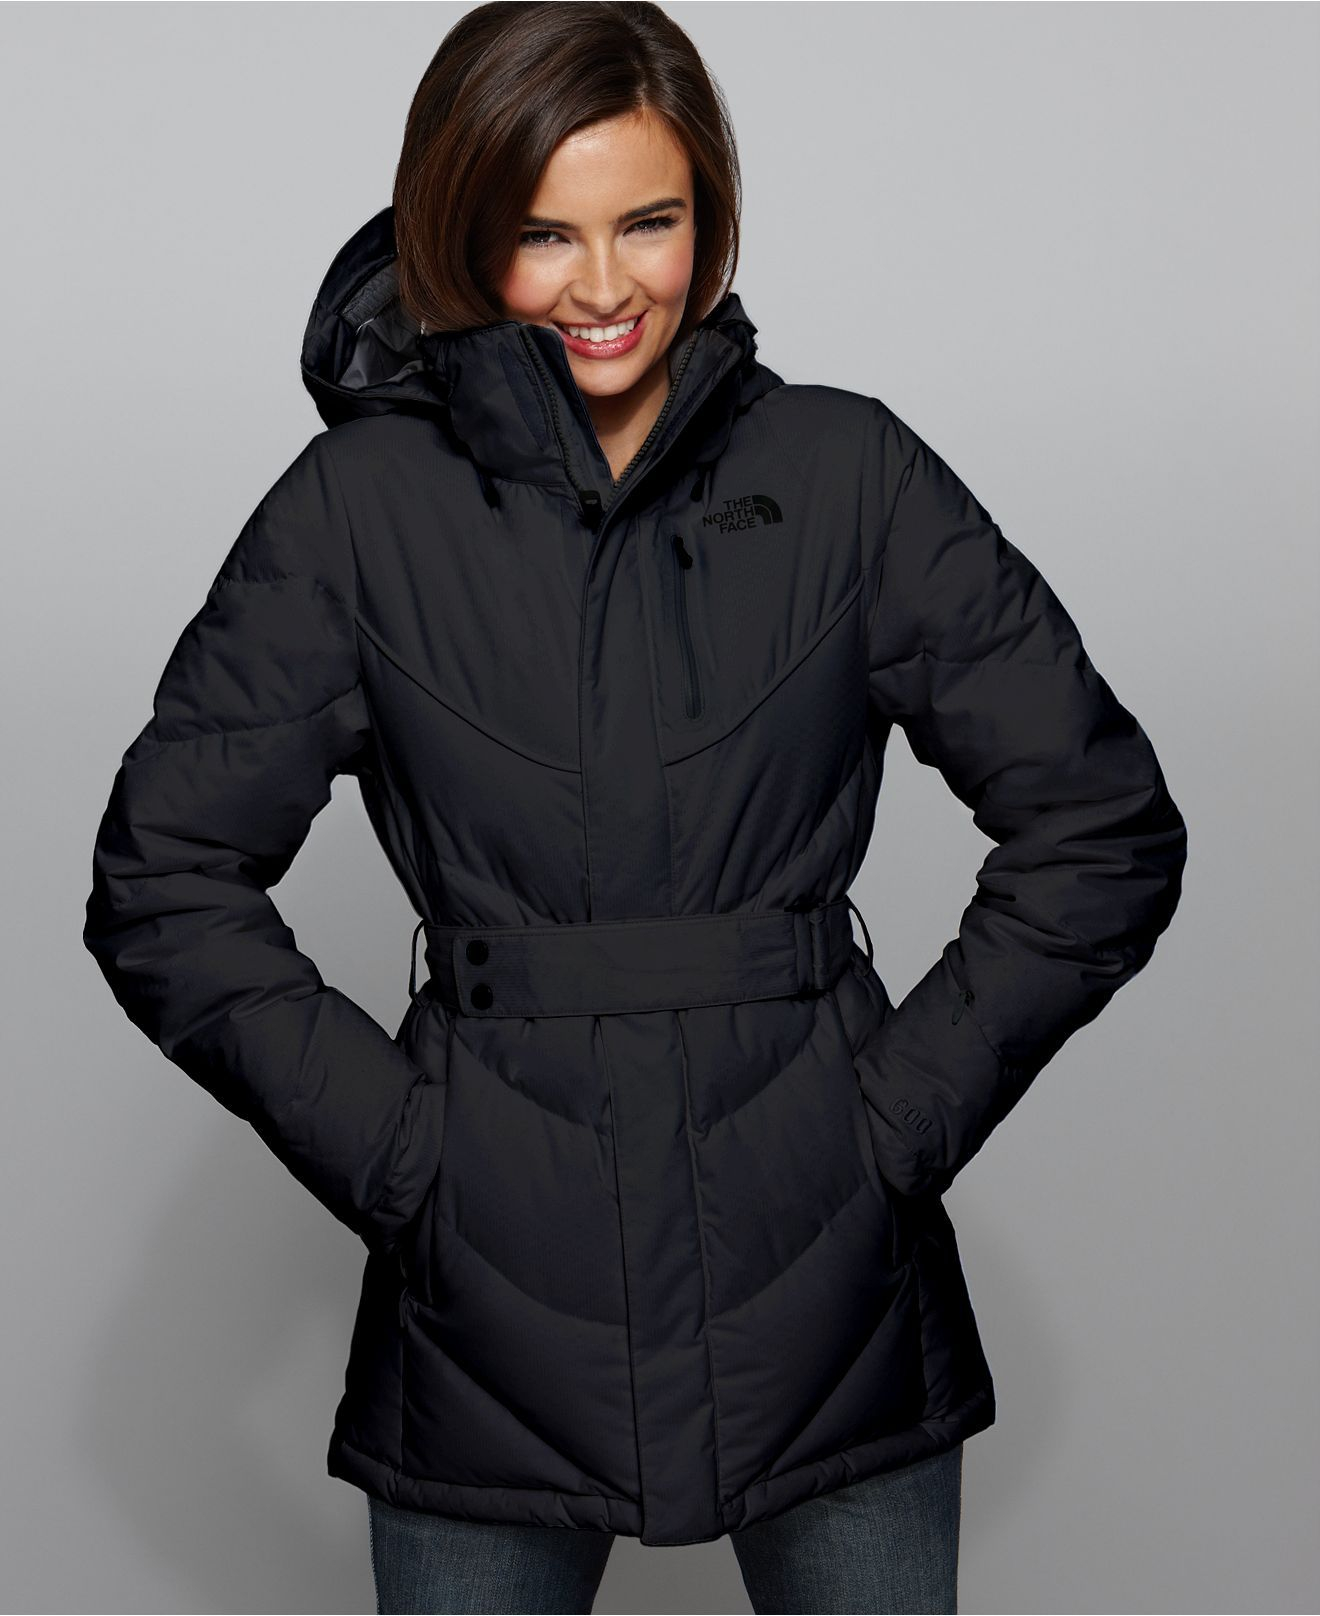 The North Face Coat Greta Zip Front Belted Puffer In Black 299 North Face Coat Coat Winter Coat Warmest [ 1616 x 1320 Pixel ]